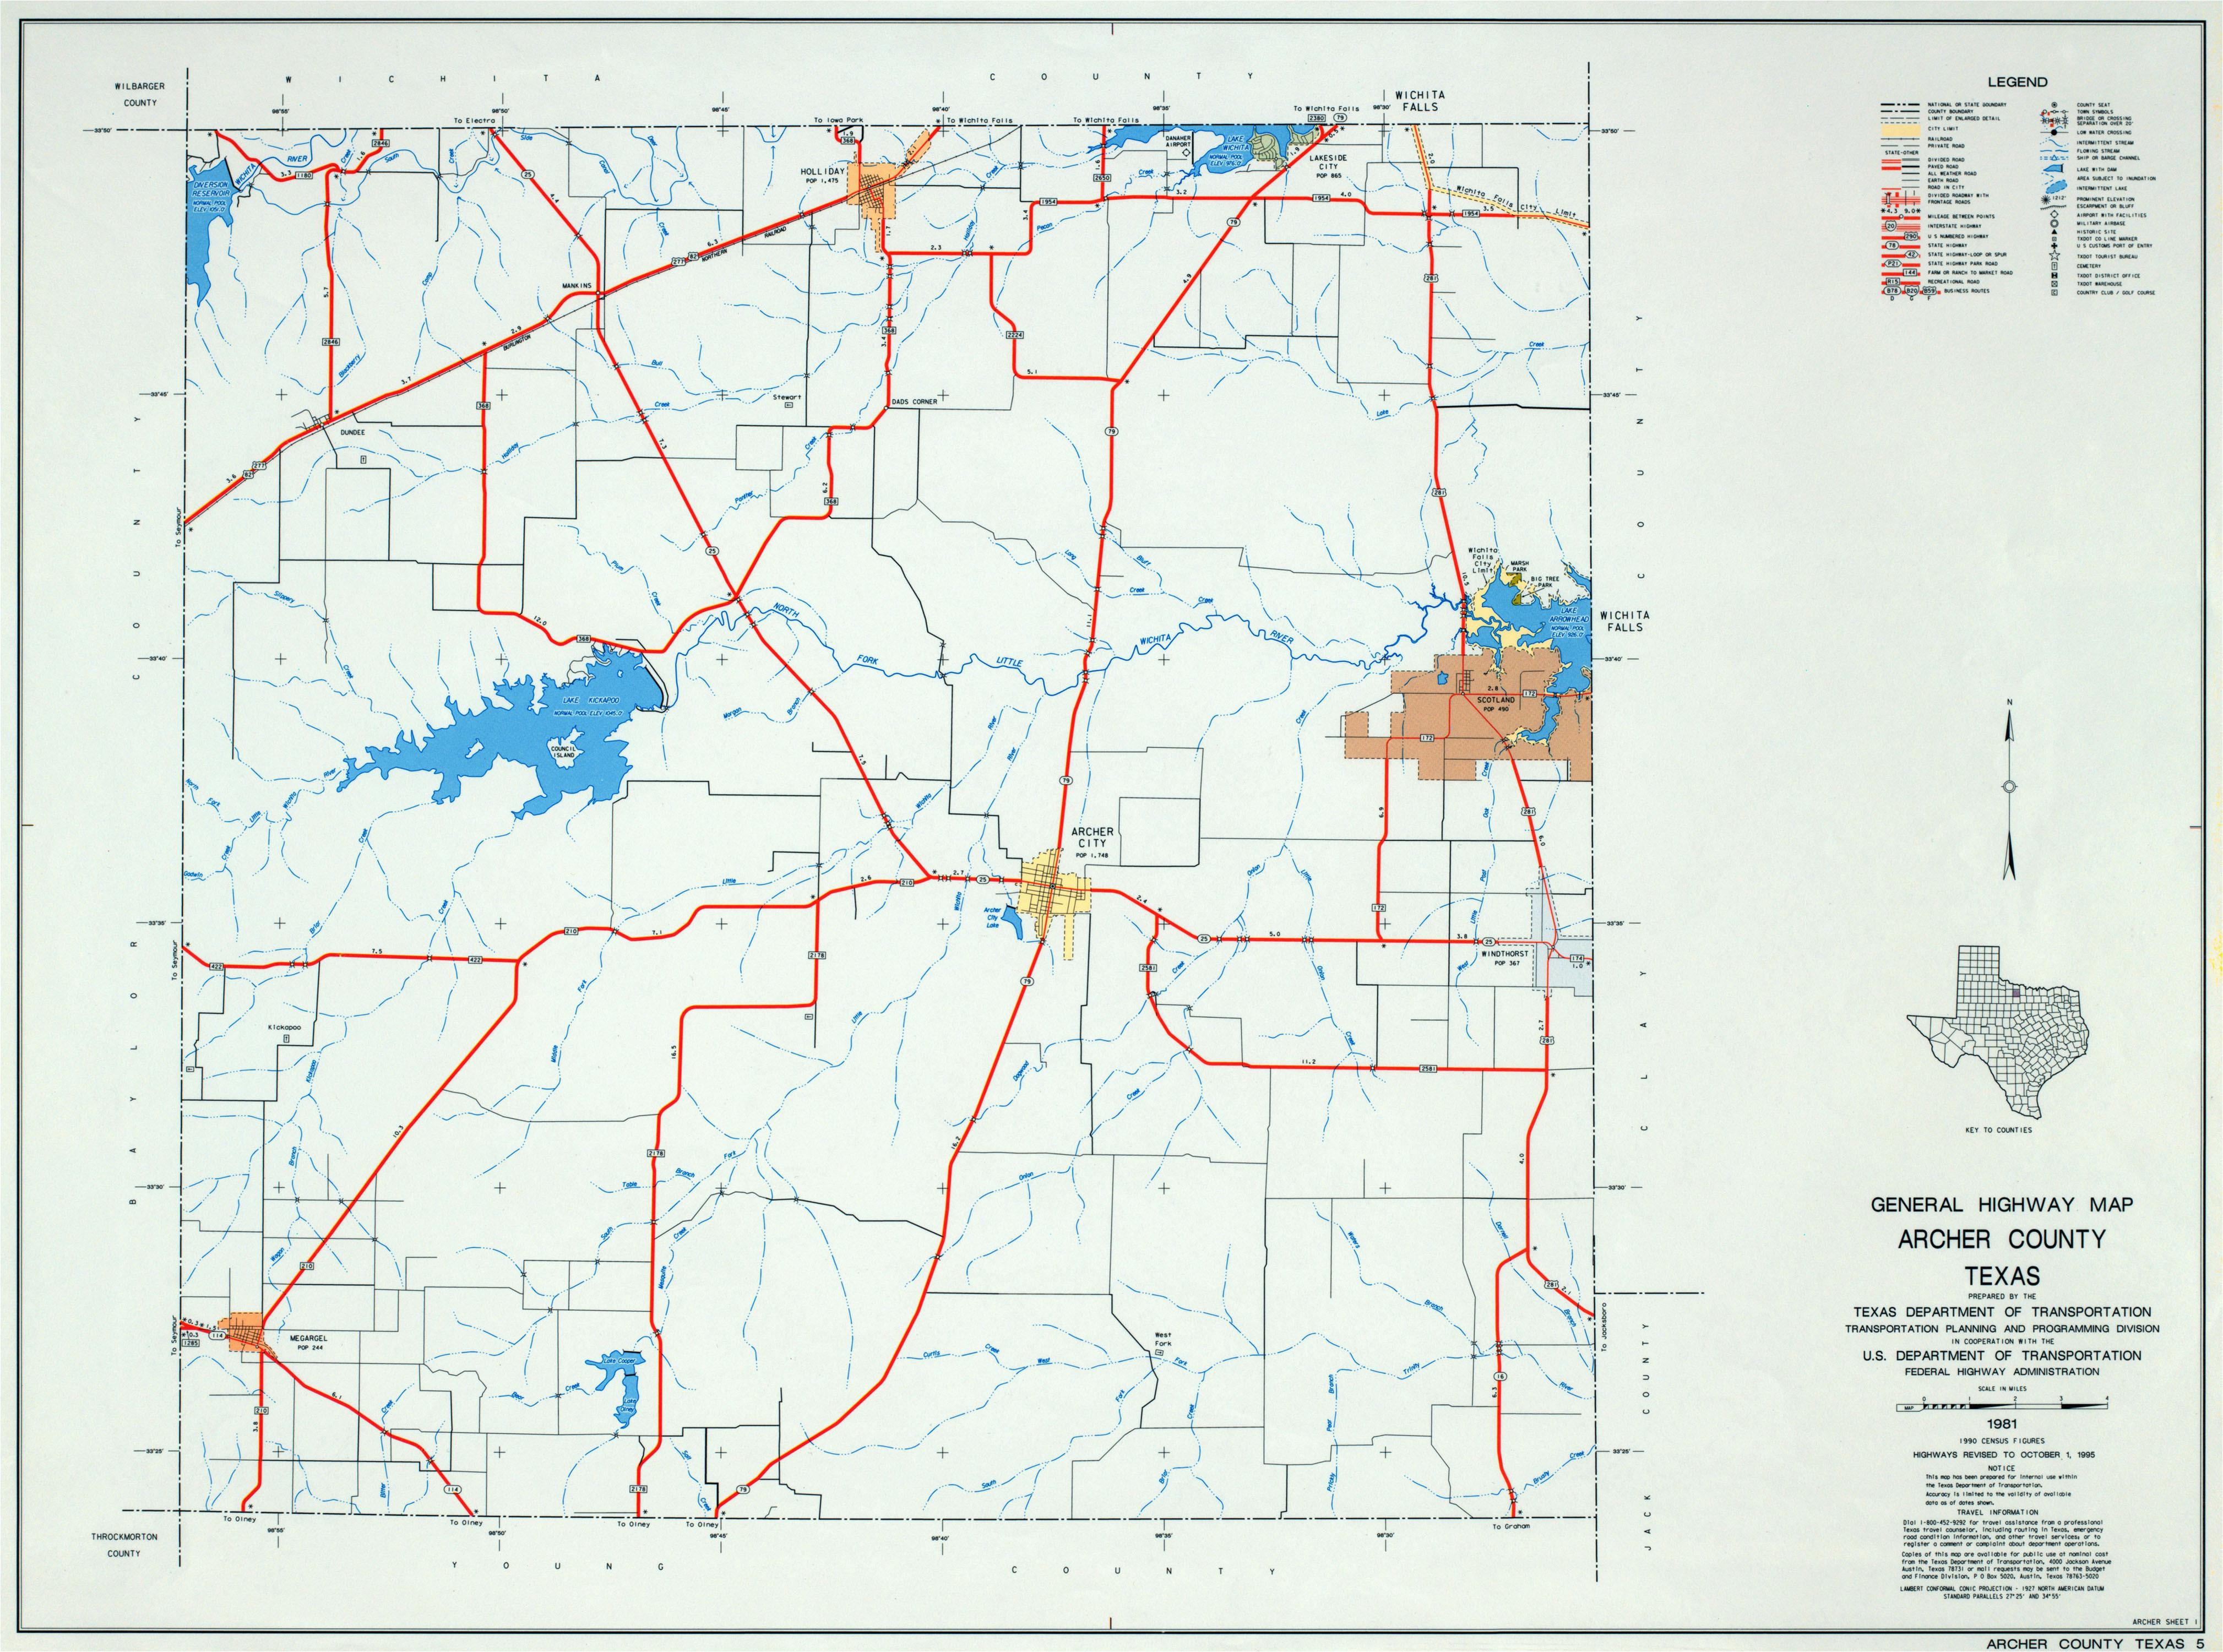 Karnes City Texas Map | secretmuseum on hale county road map, mason county road map, blanco county road map, bee county road map, kent county road map, hood county road map, la salle county road map, lee county road map, hartley county road map, dallam county road map, gregg county road map, jasper county road map, putnam county road map, mills county road map, wilson county road map, jim wells county road map, williamson county road map, upton county road map, rockwall county road map,